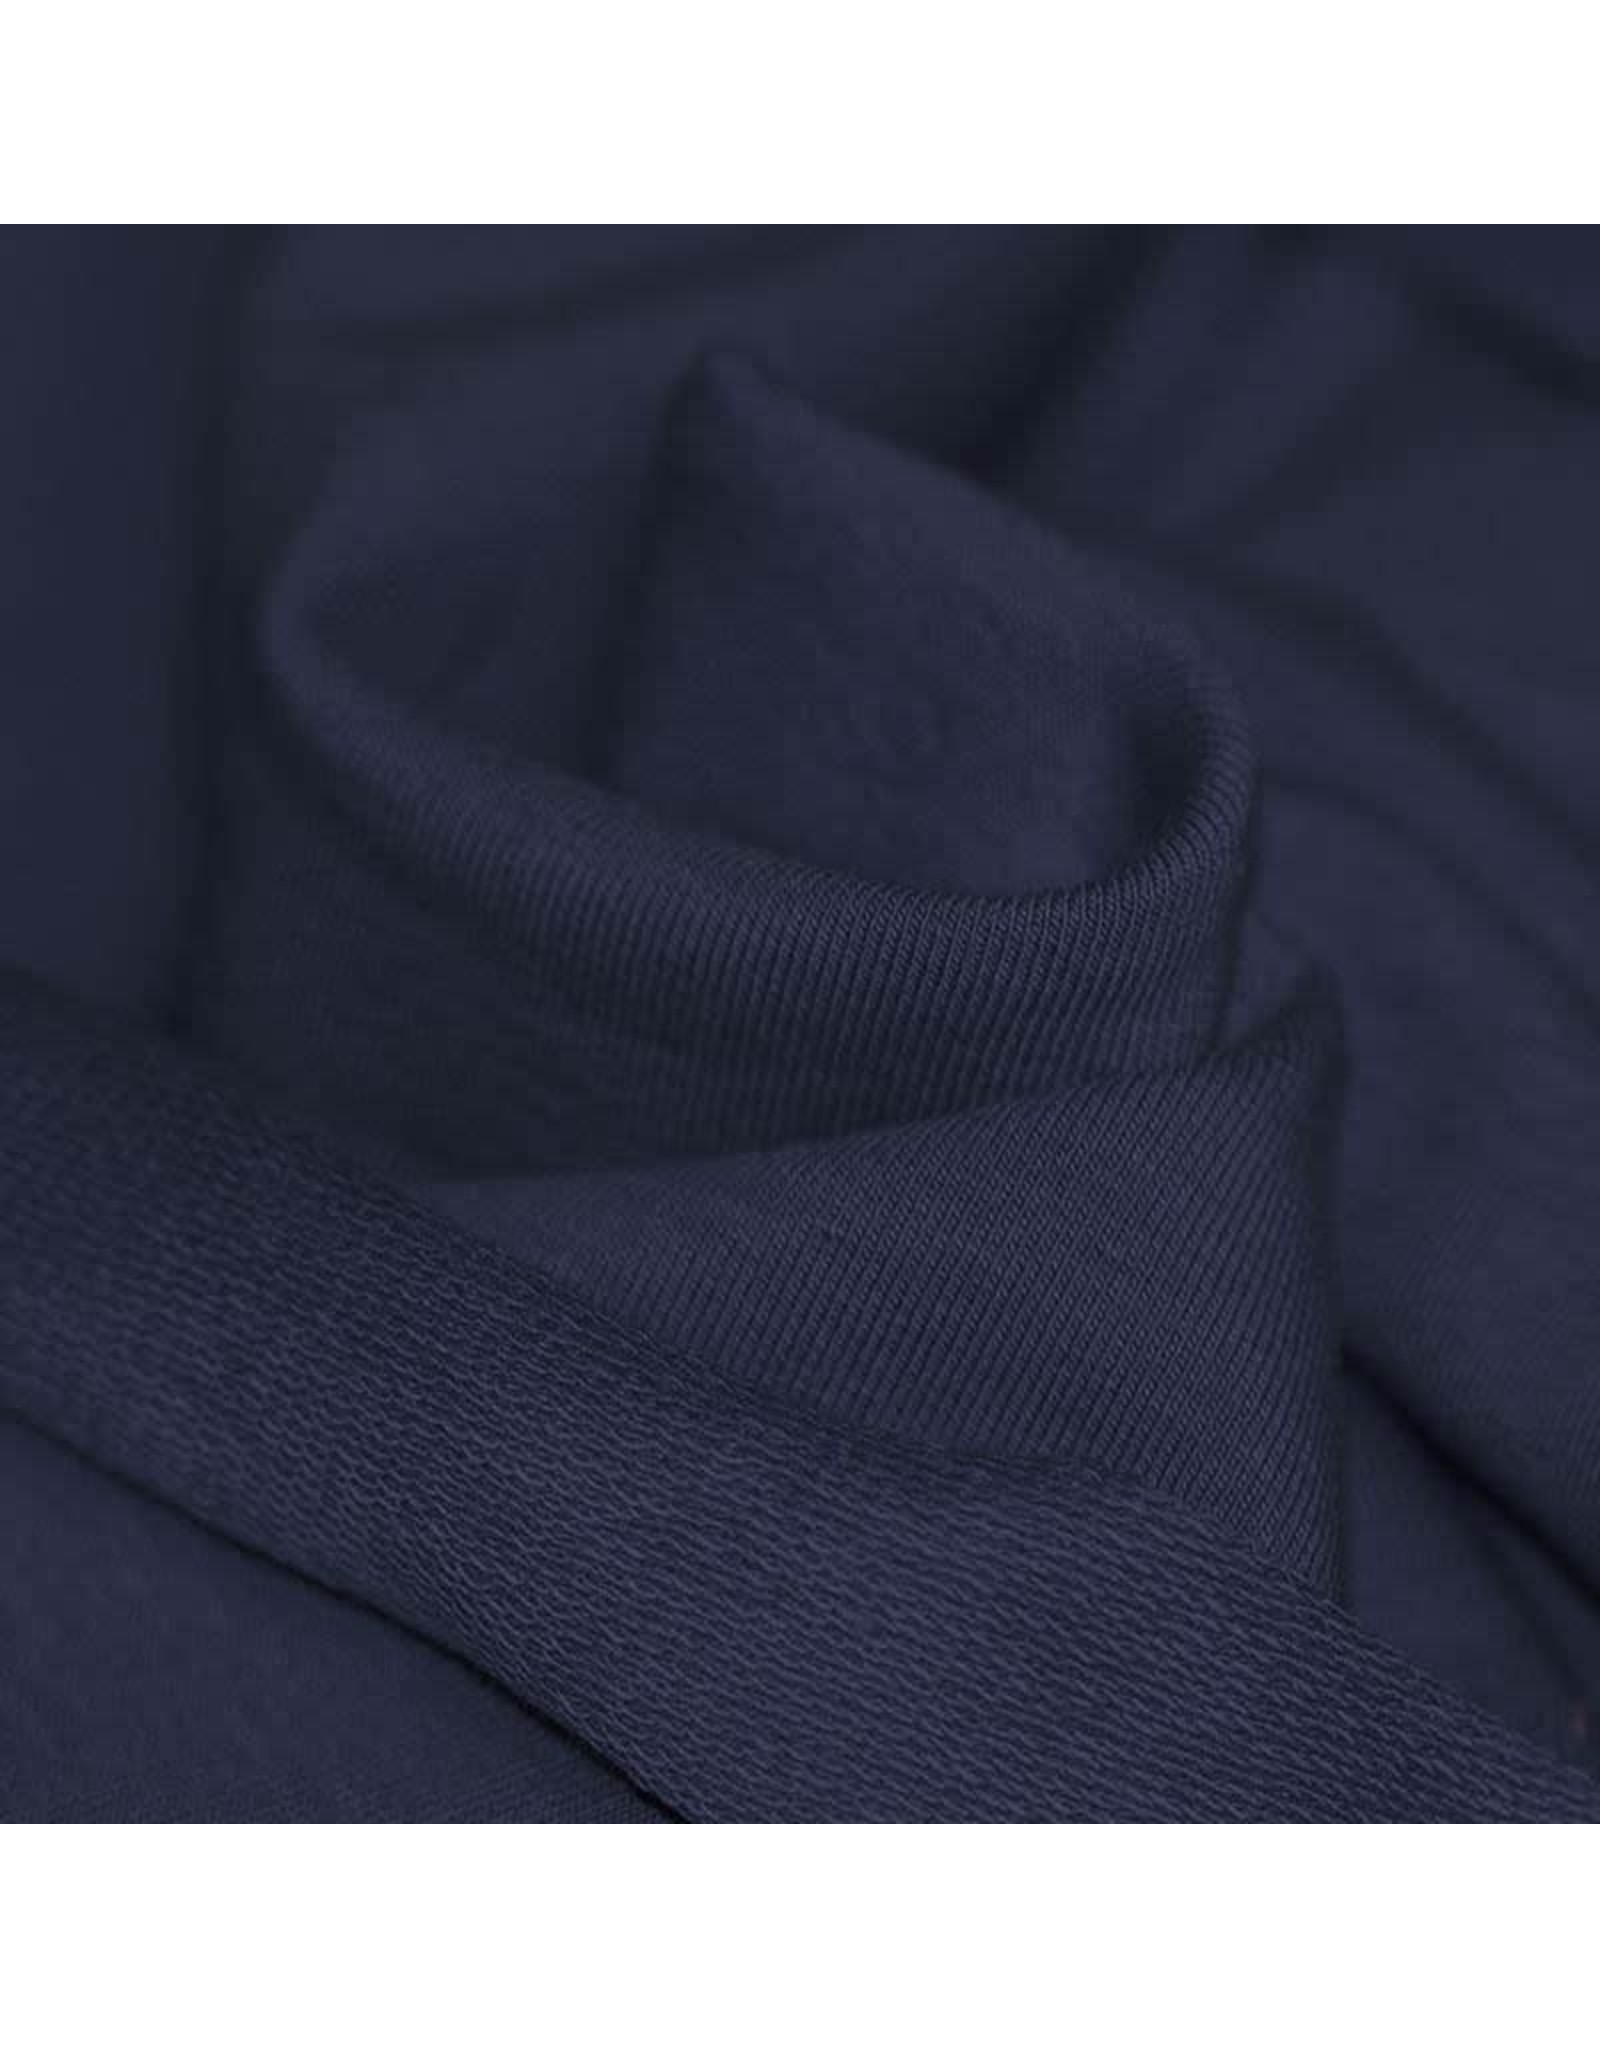 Stik-Stof Dark blue